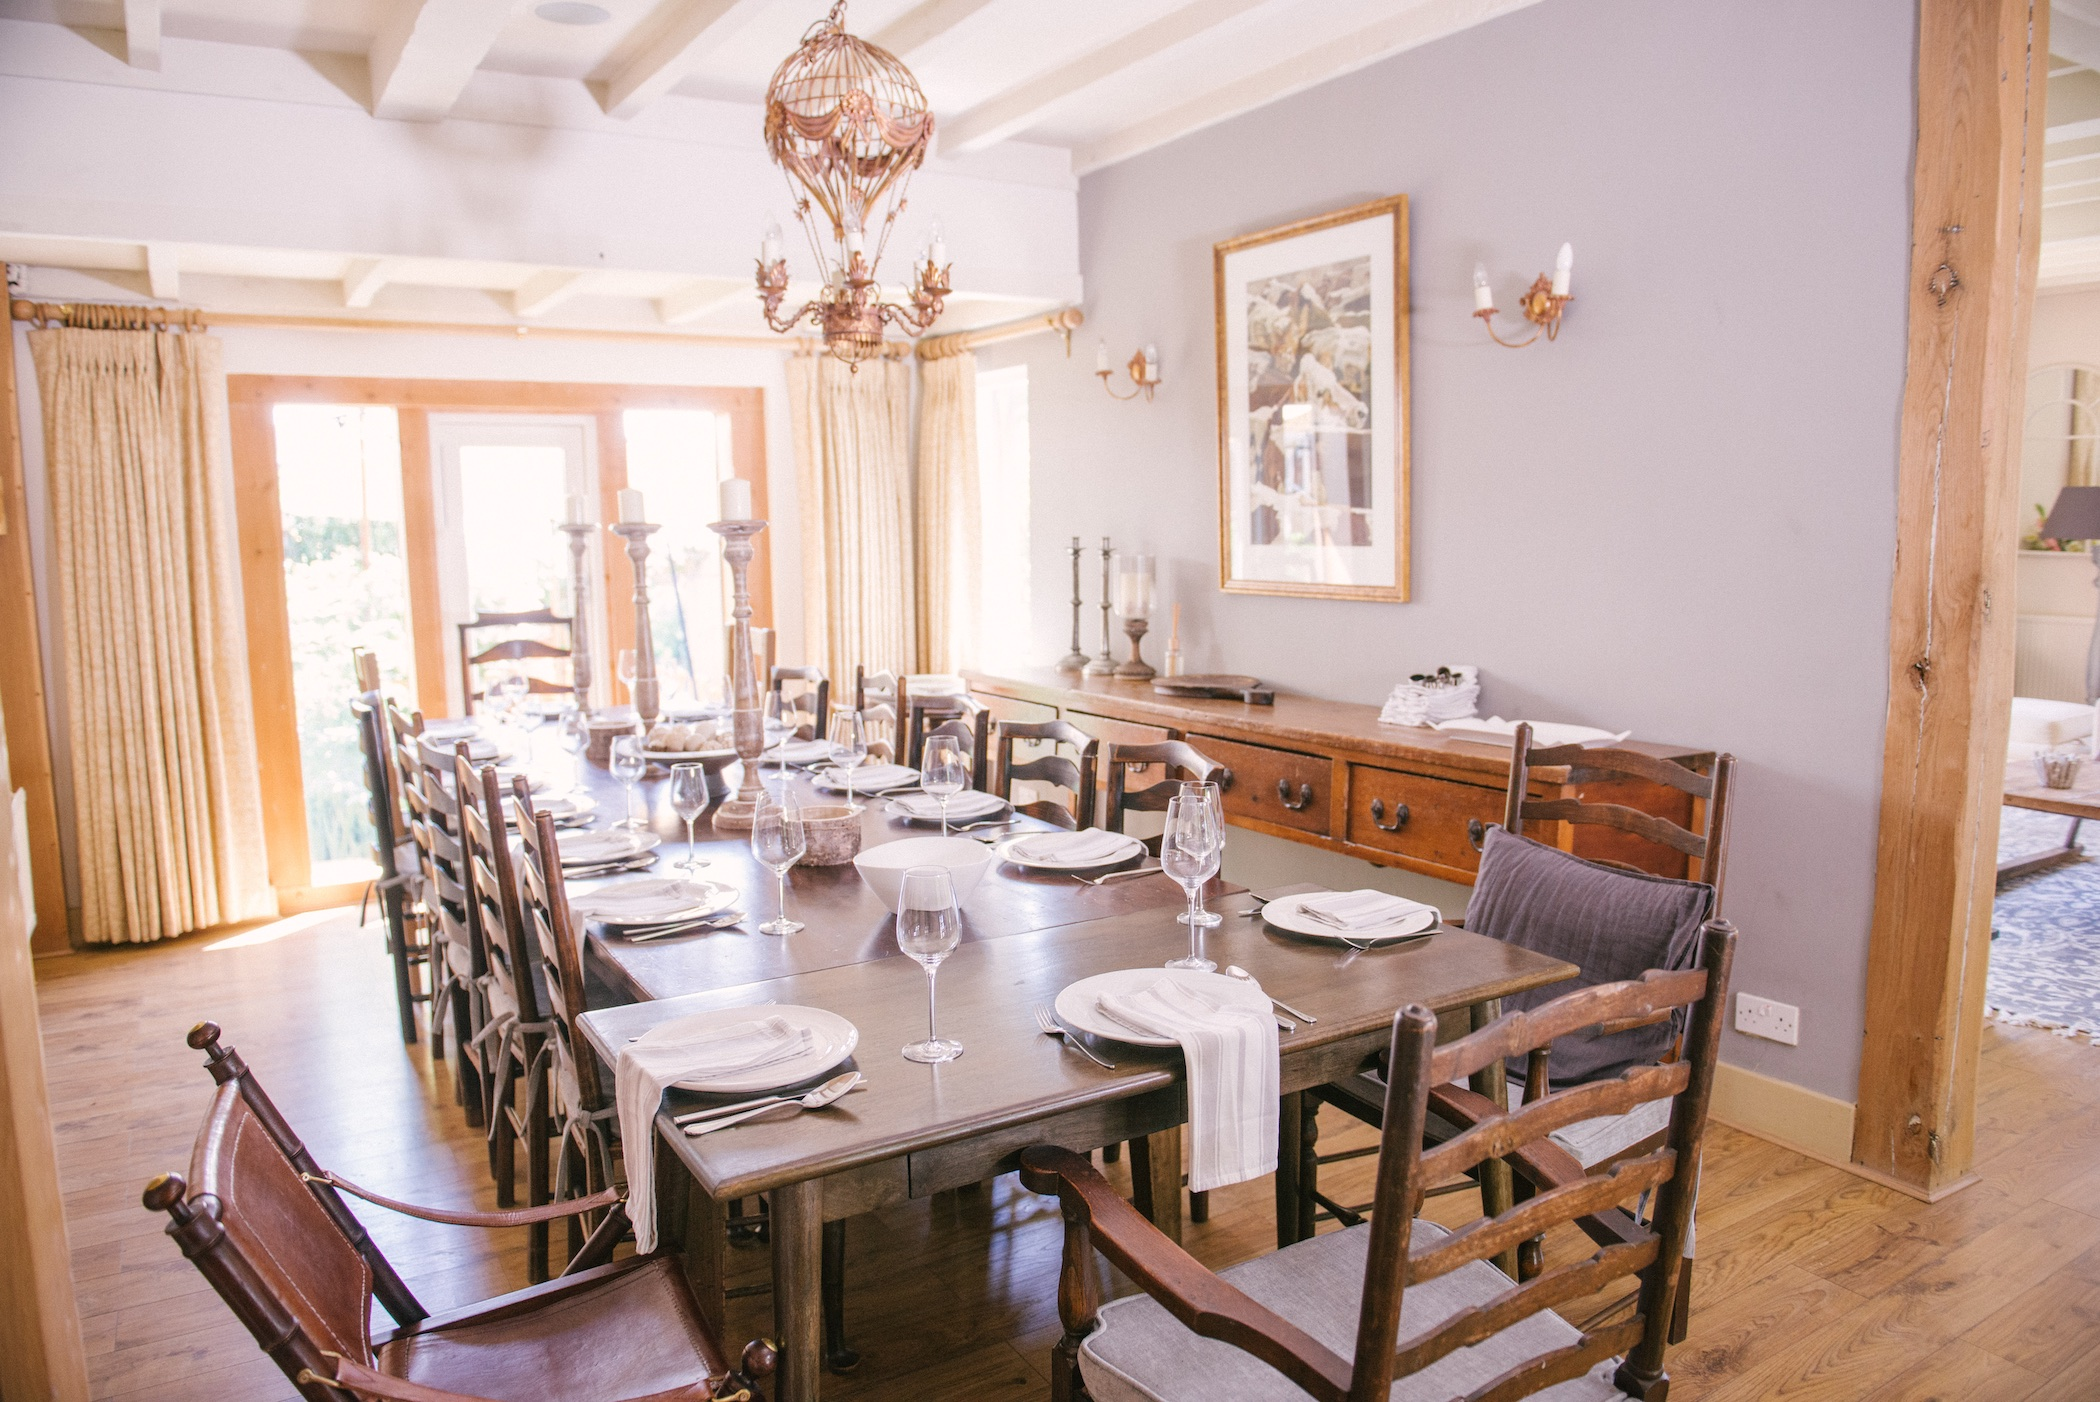 The Copse Dining Room - Hannah Duffy Photography 2100x1400.jpg